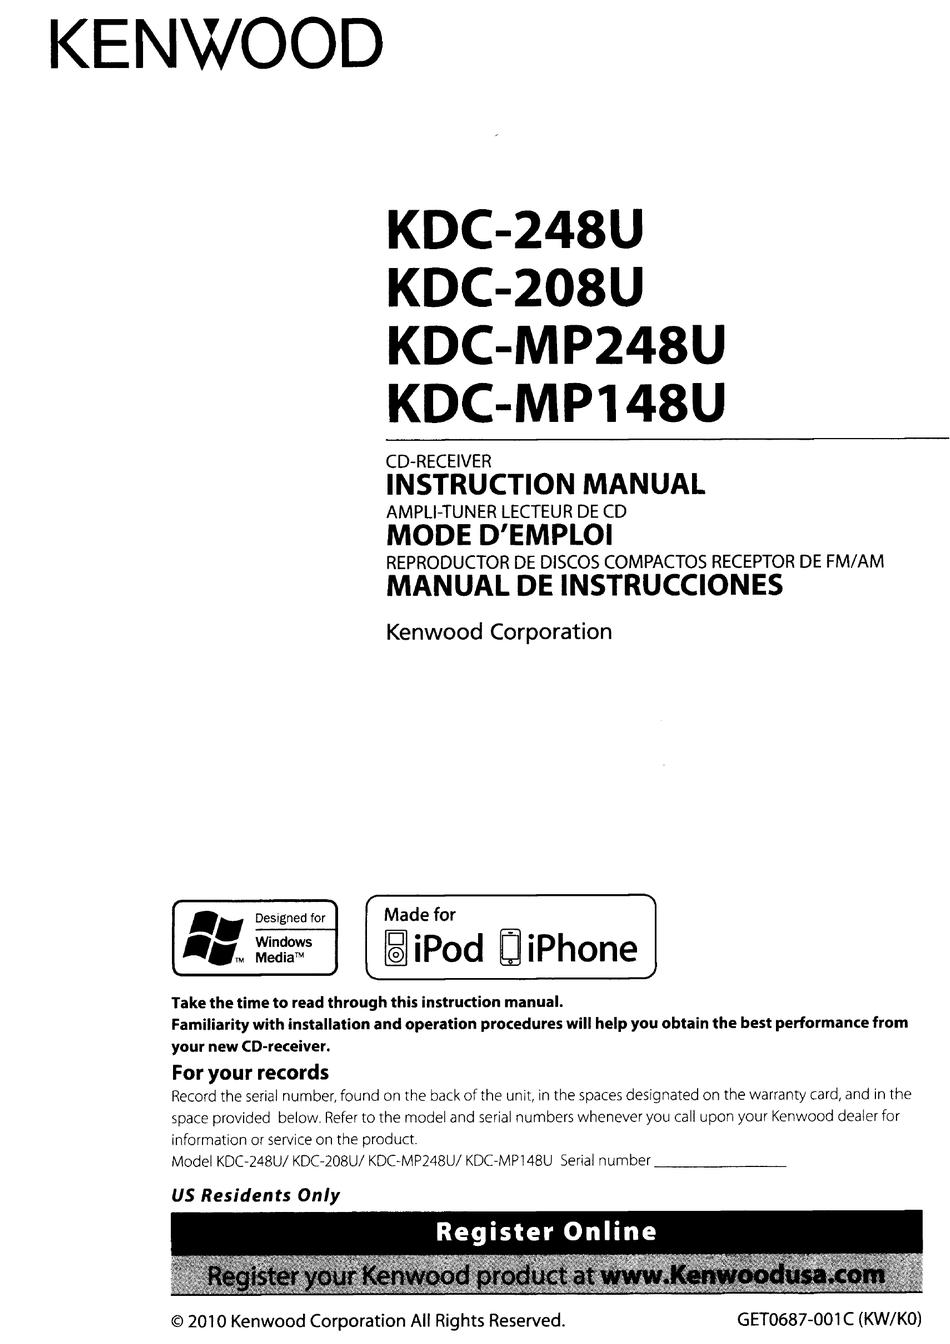 Kenwood Kdc-248U Wiring Diagram from static-data2.manualslib.com